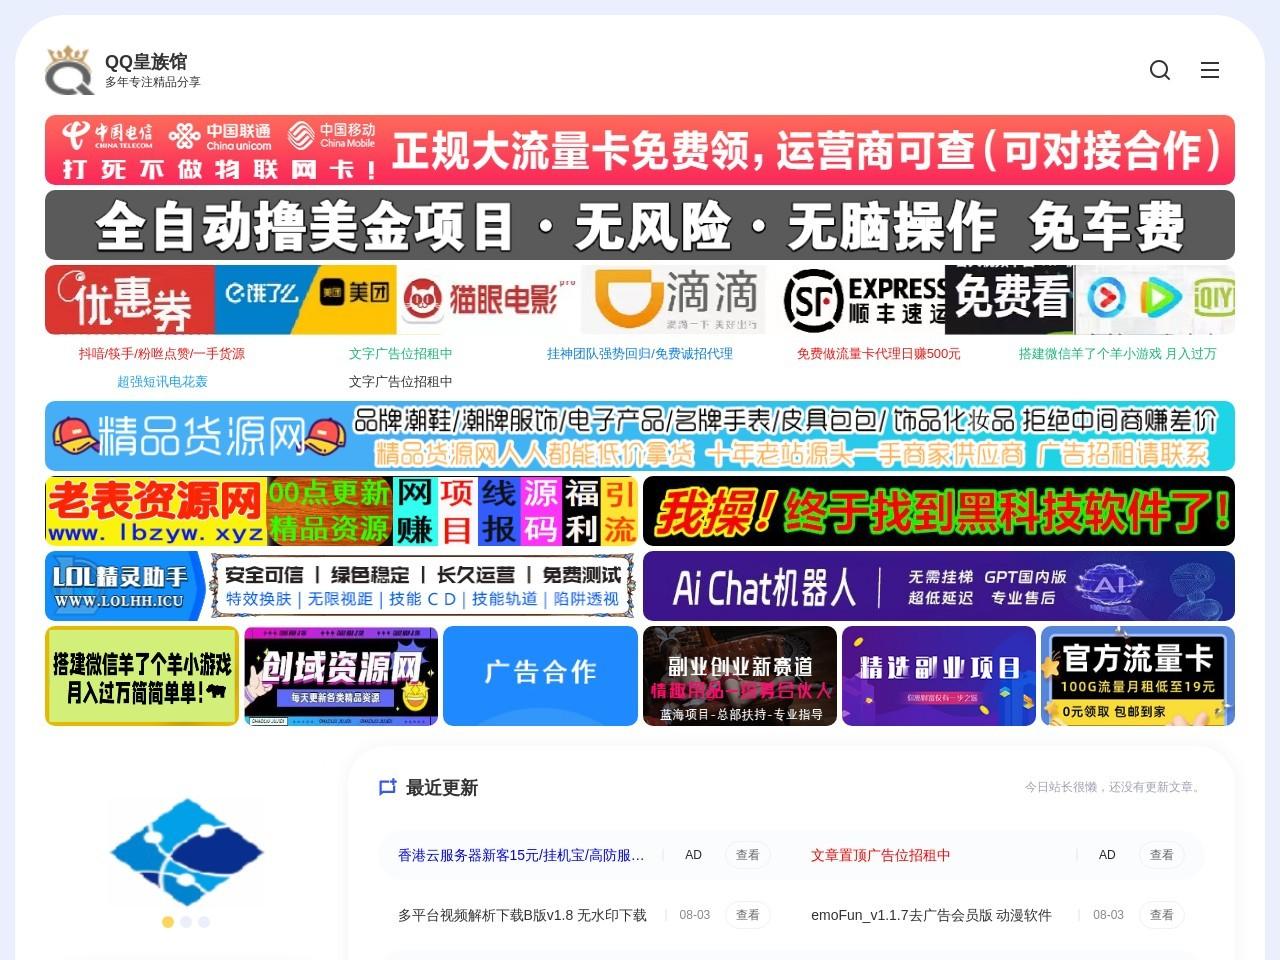 QQ皇族馆-站长导航网